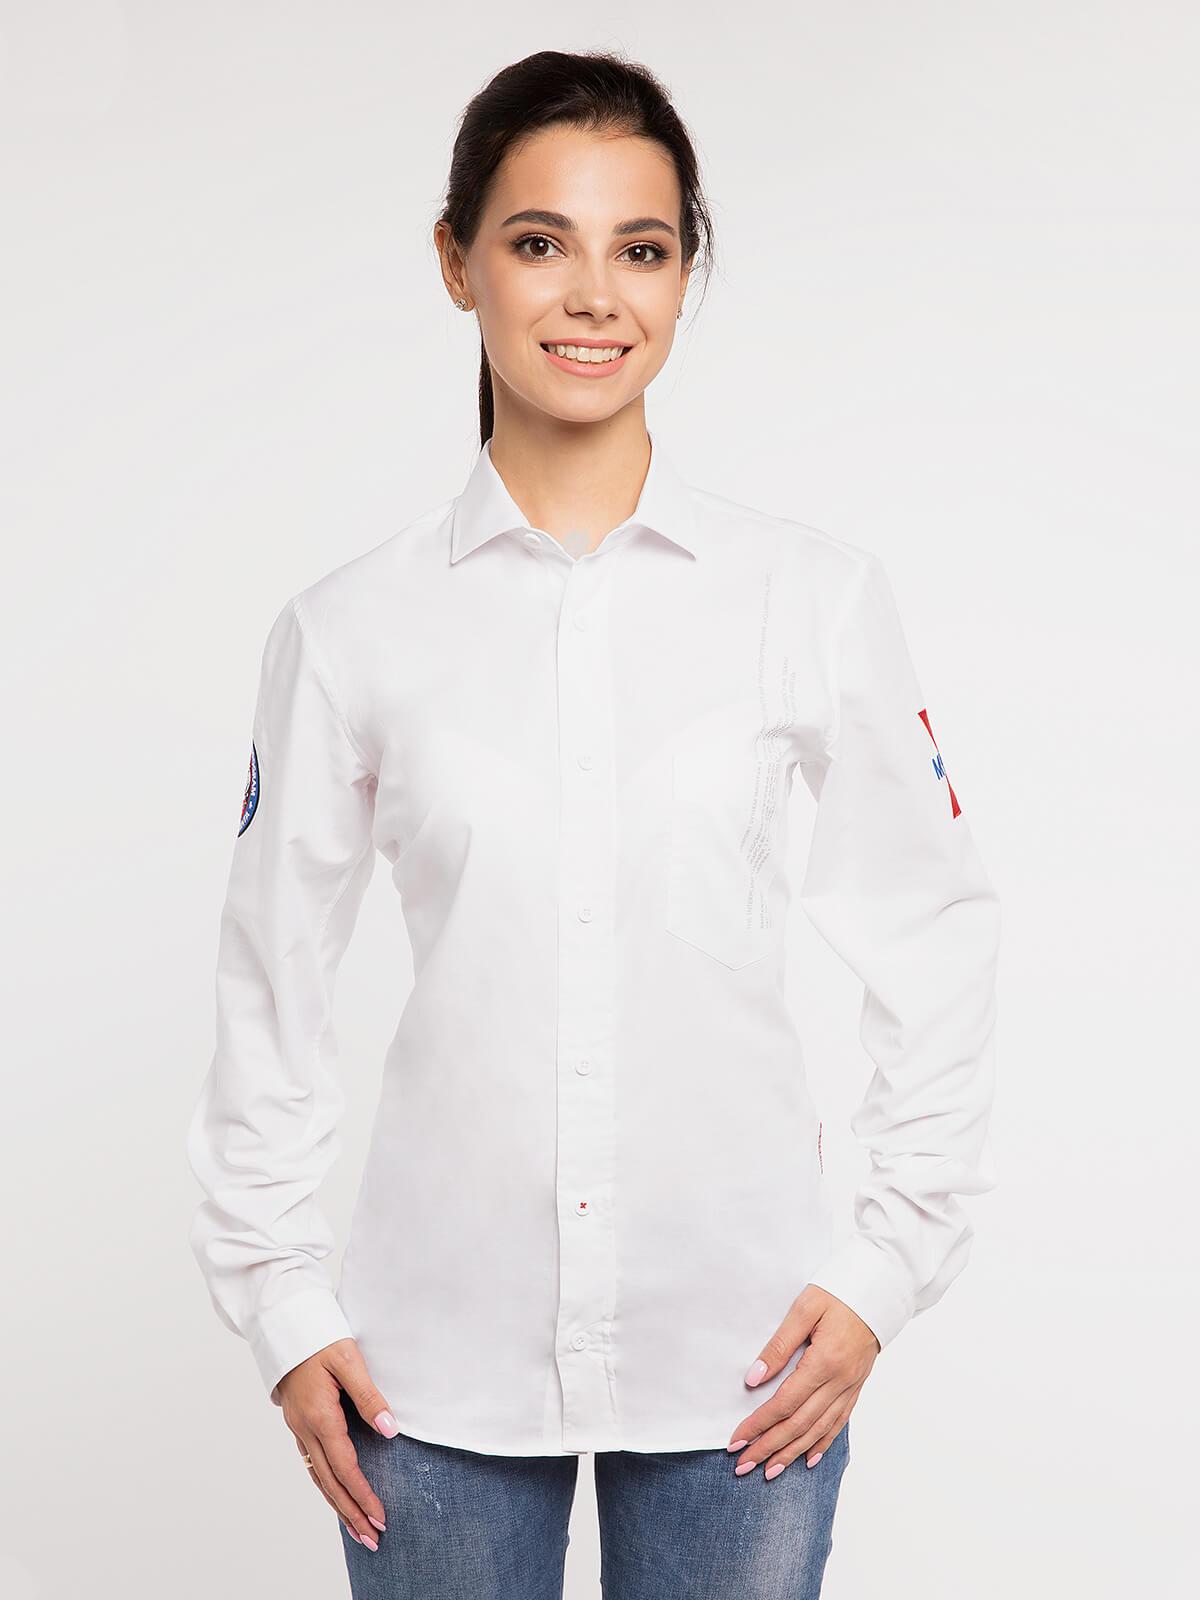 Women's Shirt Molfar-X. Color white. Pique fabric: 100% cotton.